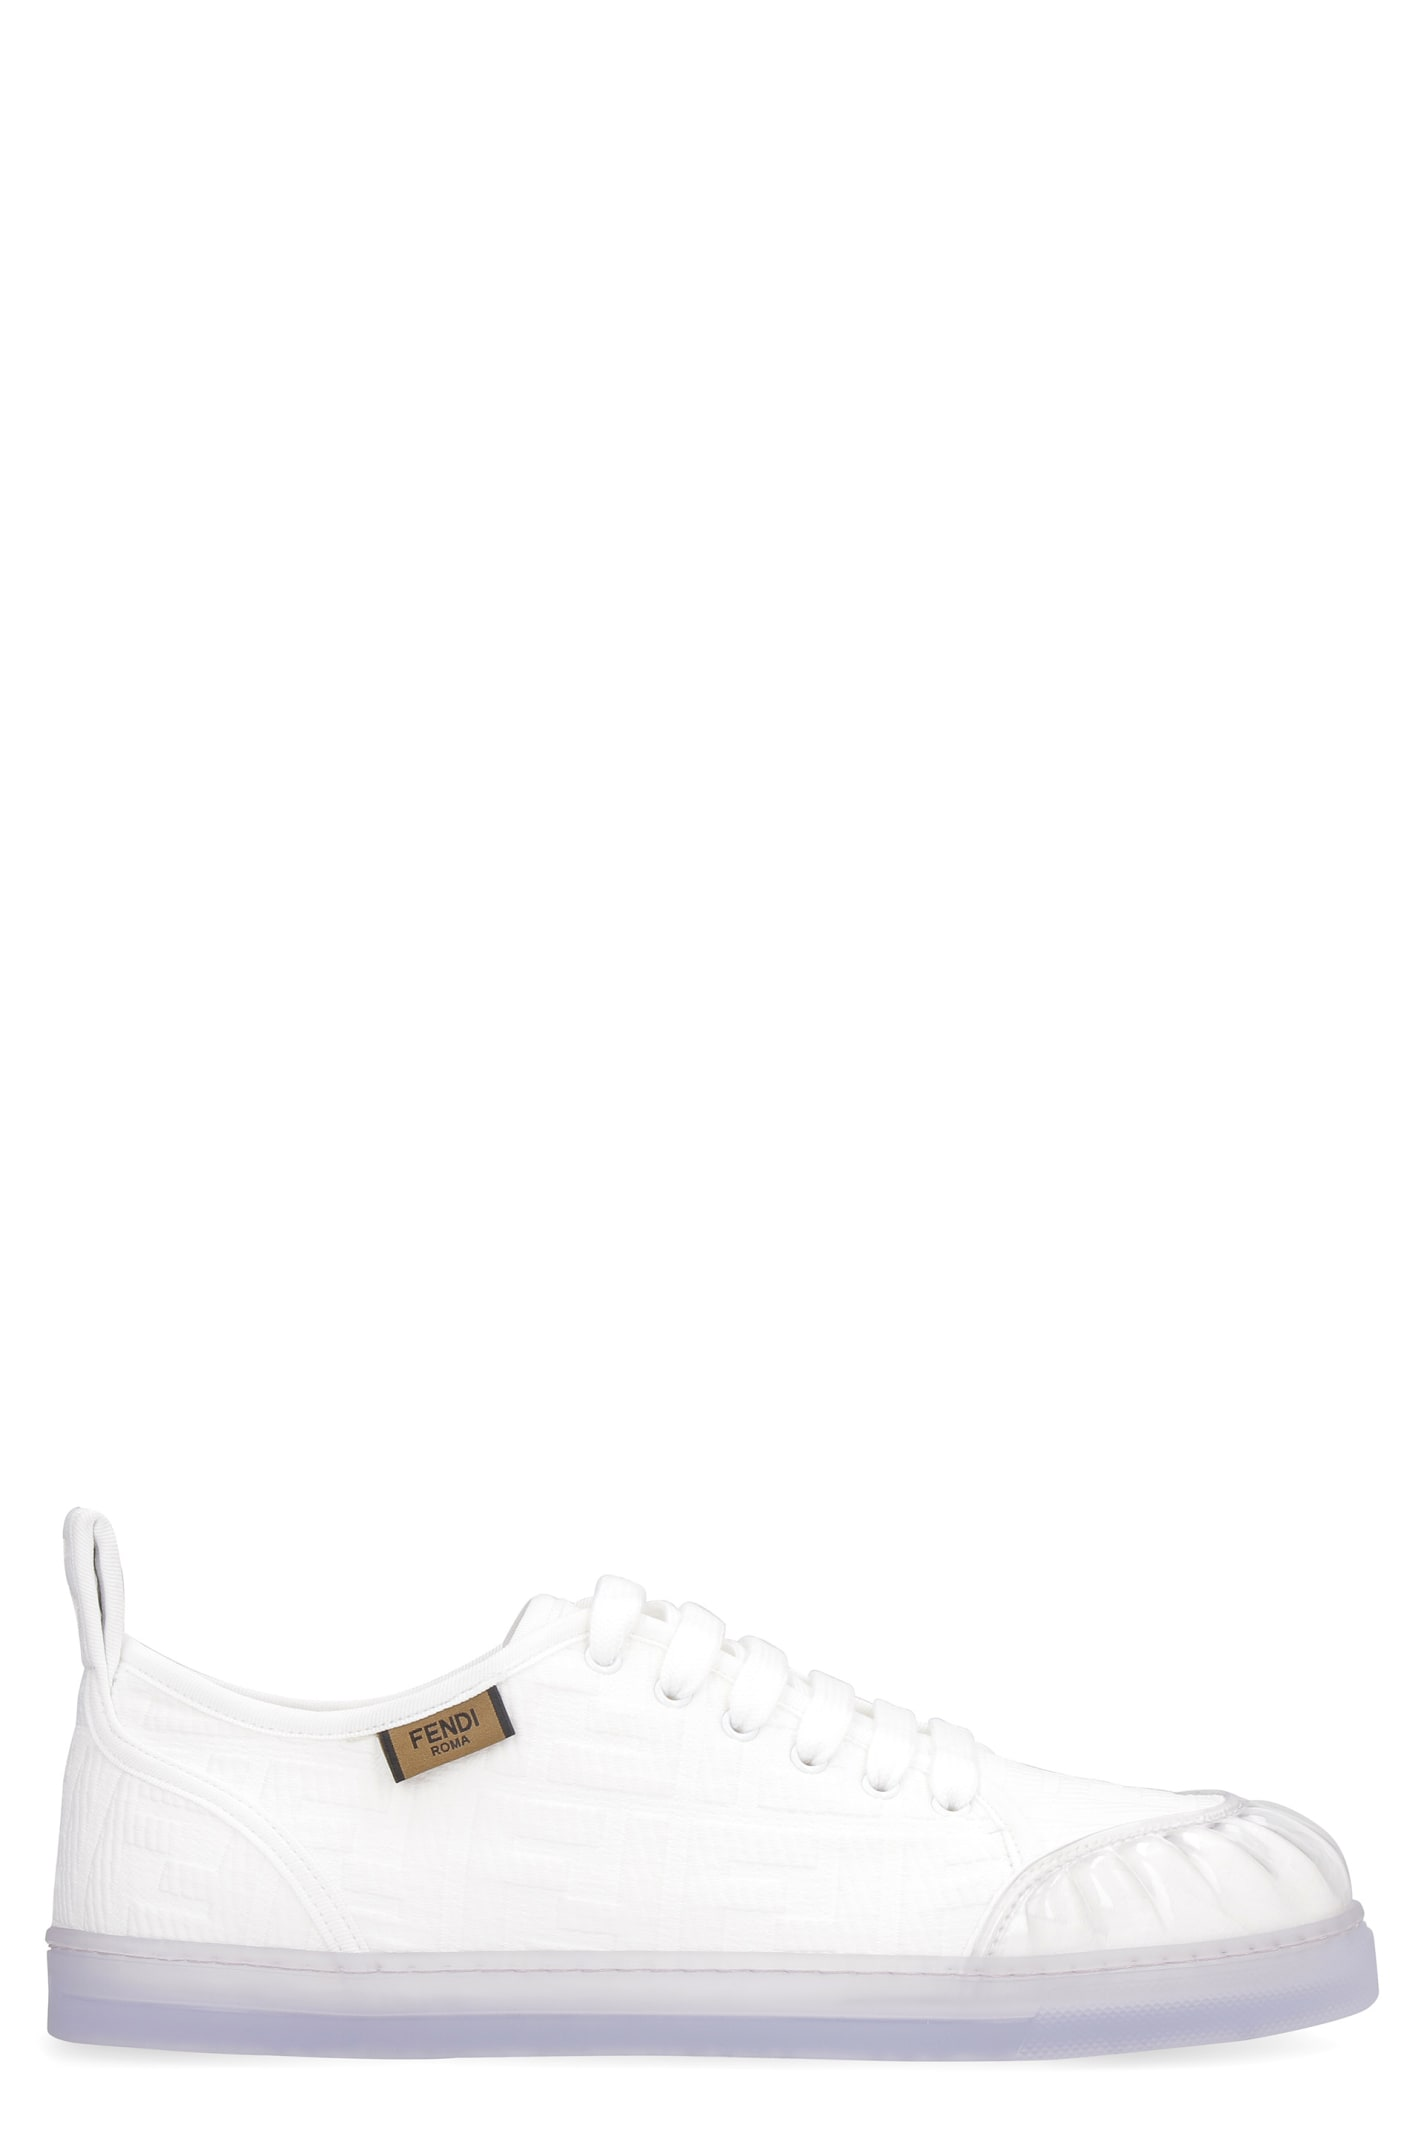 Fendi Promenade Canvas Sneakers